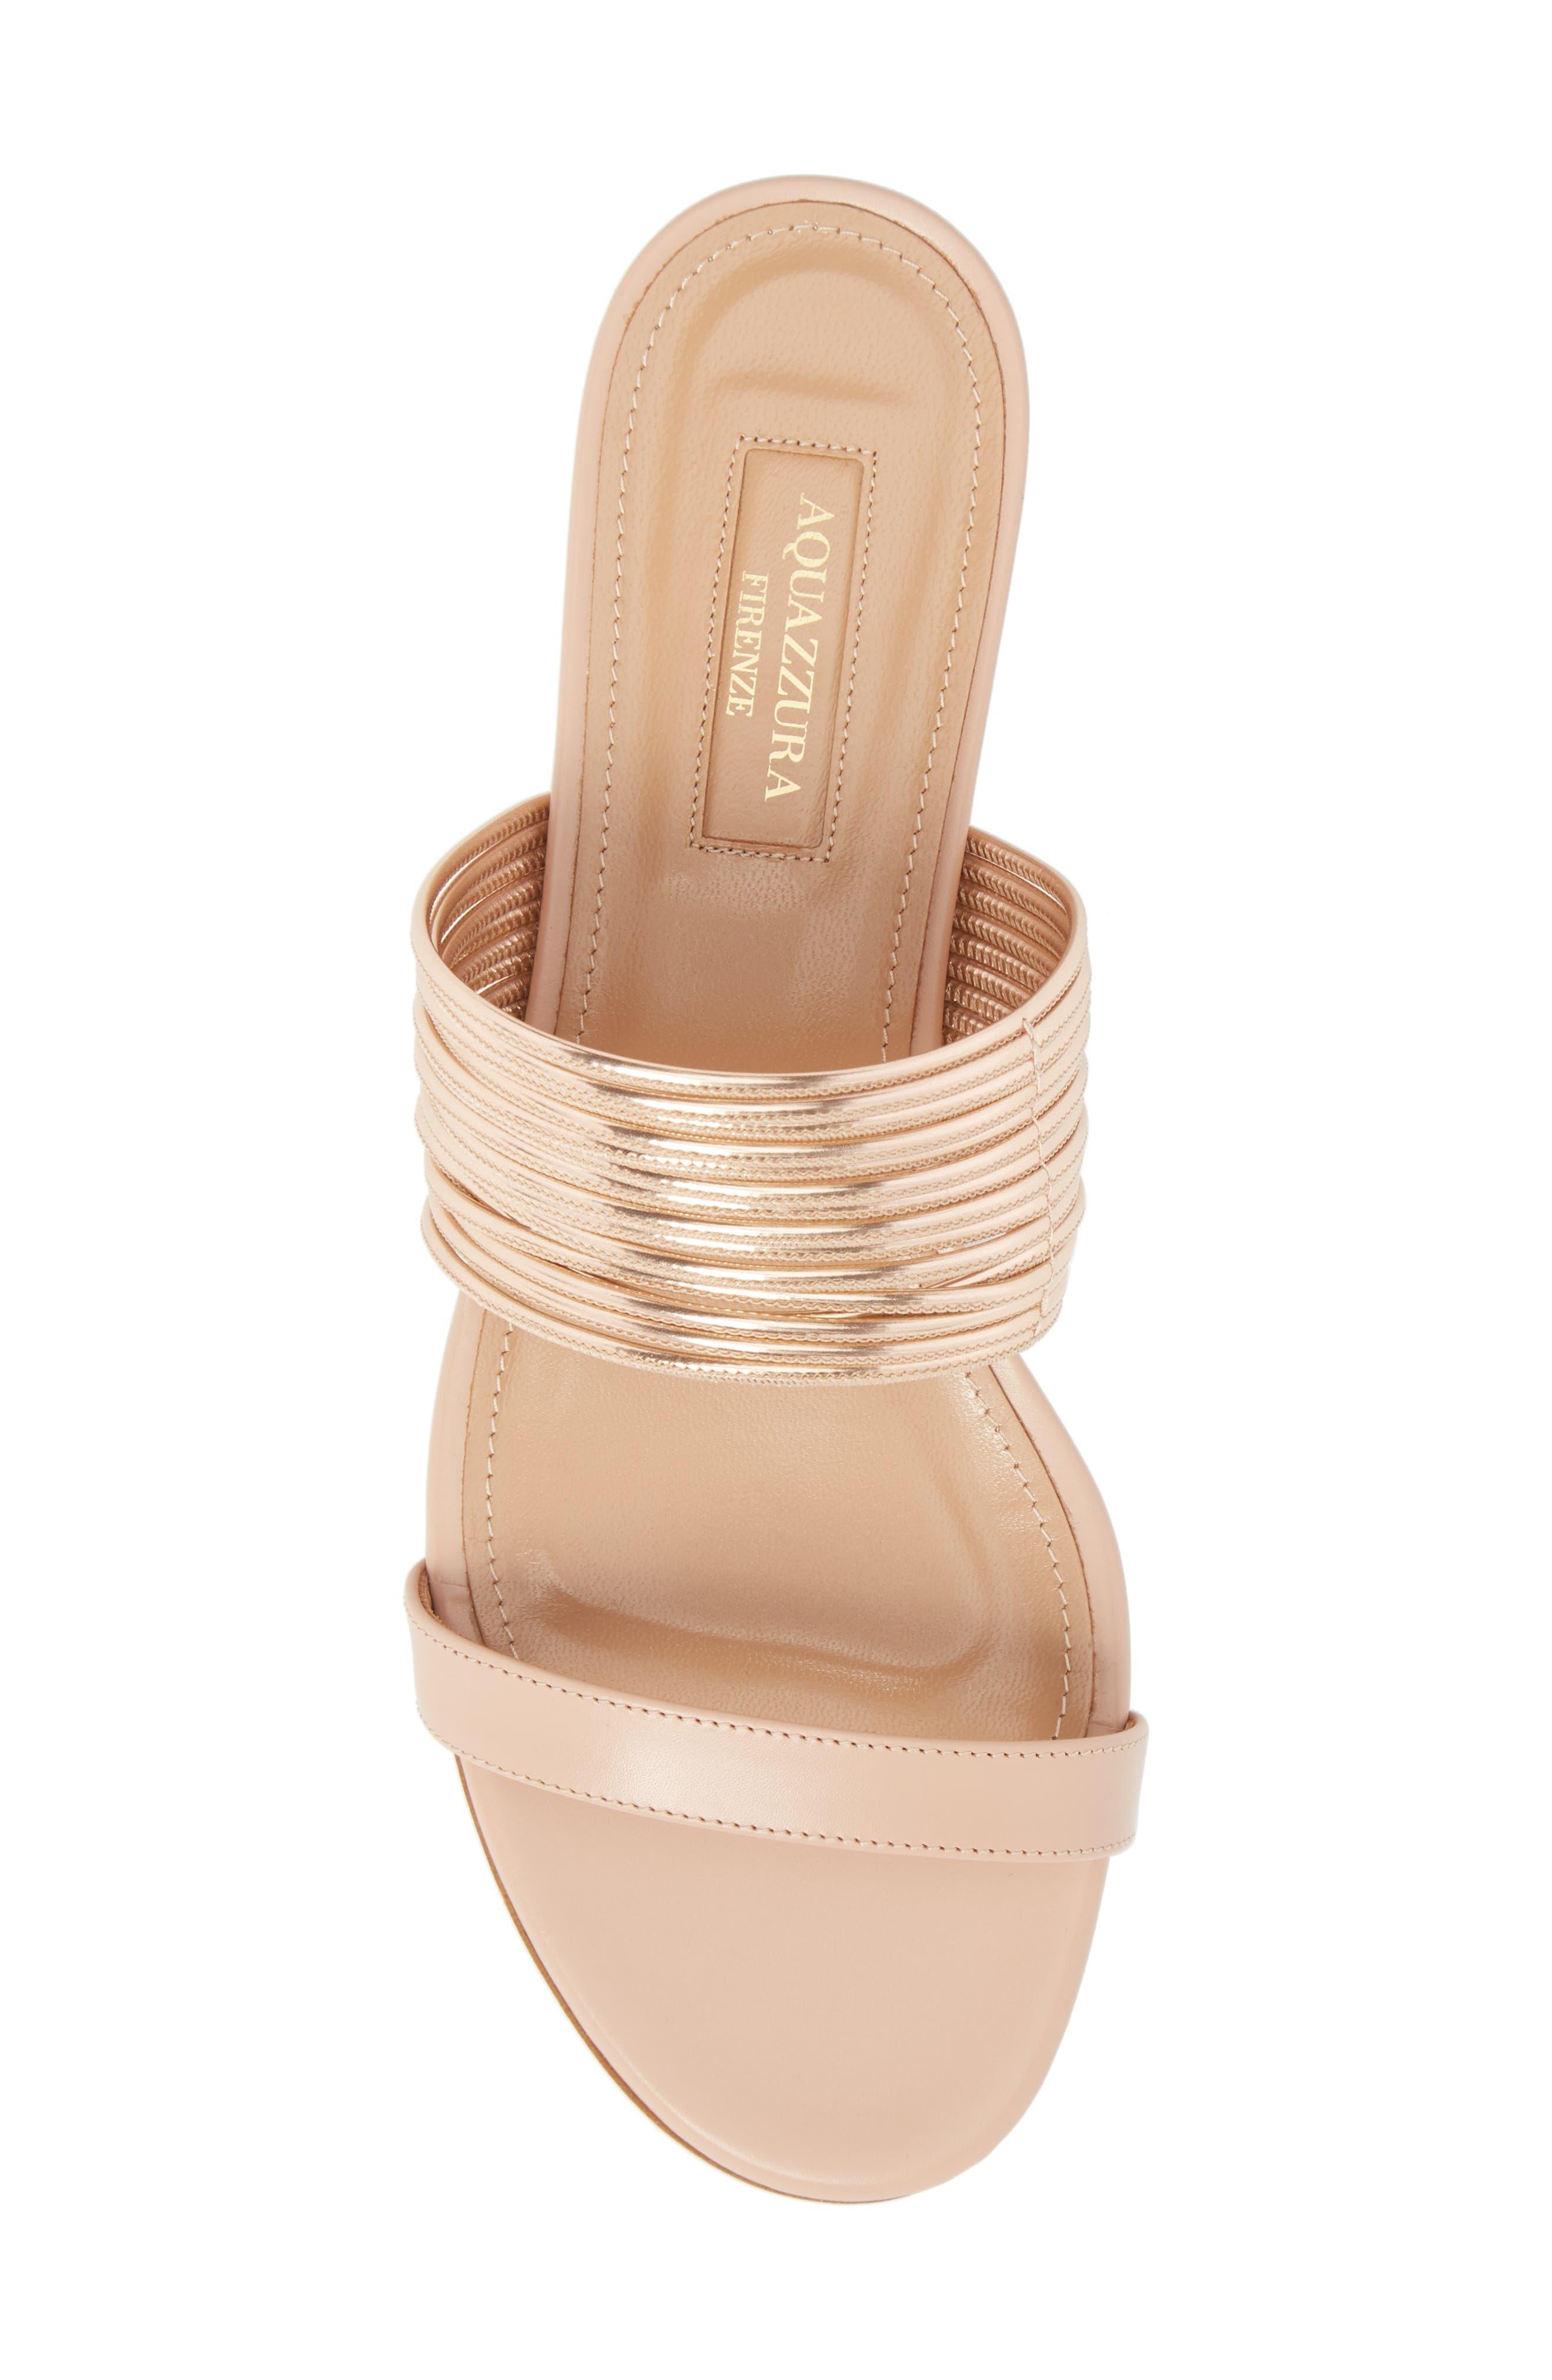 Rendezvous Metallic Sandal,                             Alternate thumbnail 5, color,                             POWDER PINK/CIPRIA